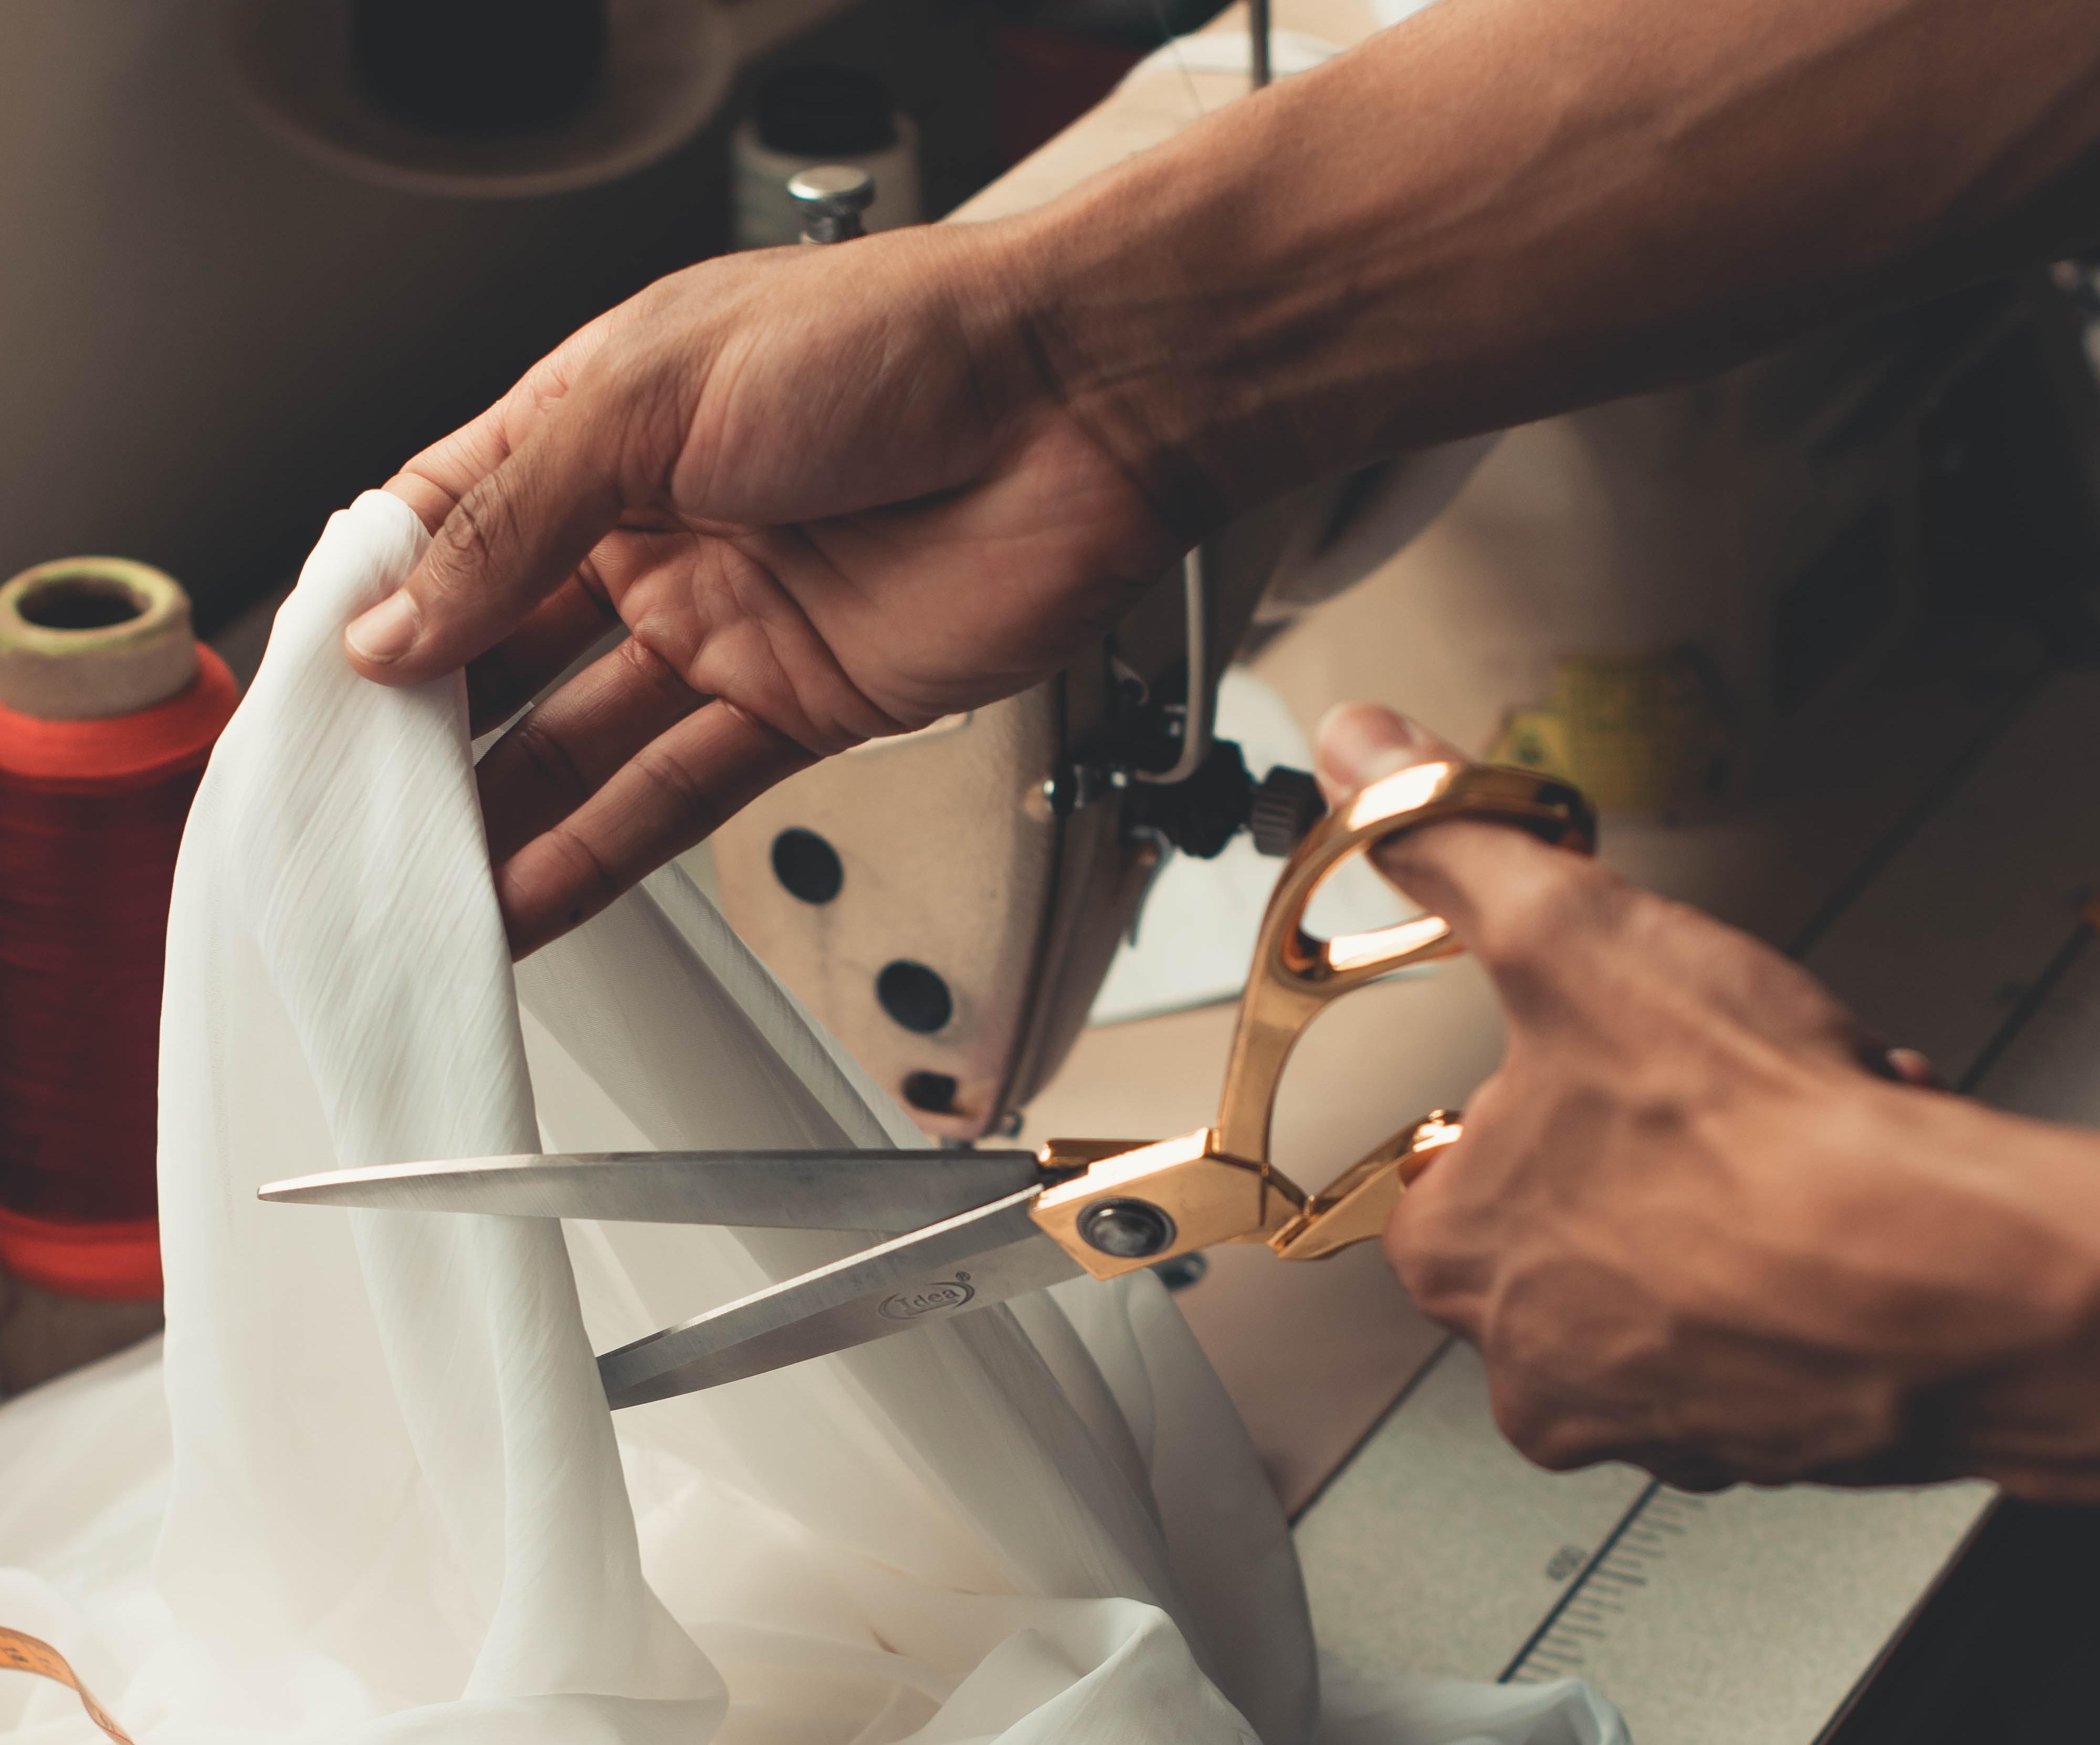 artisan cutting fabric